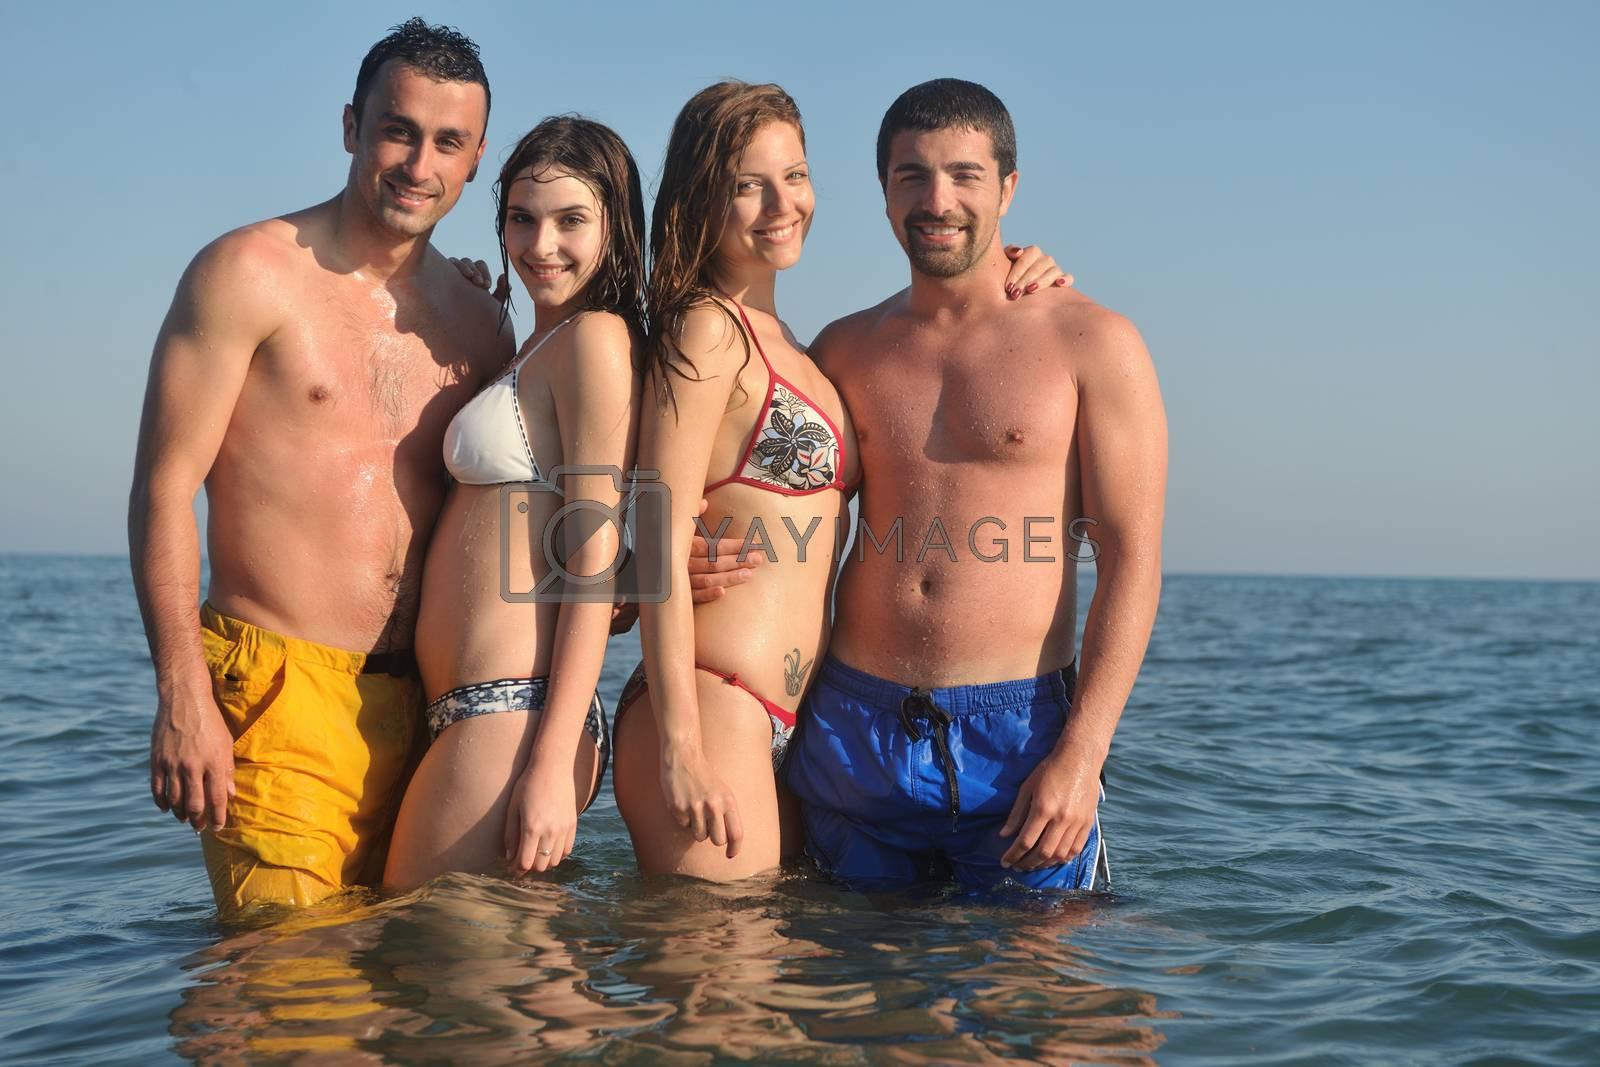 happy people group have fun  run and jump  on beach beautiful sand  beach